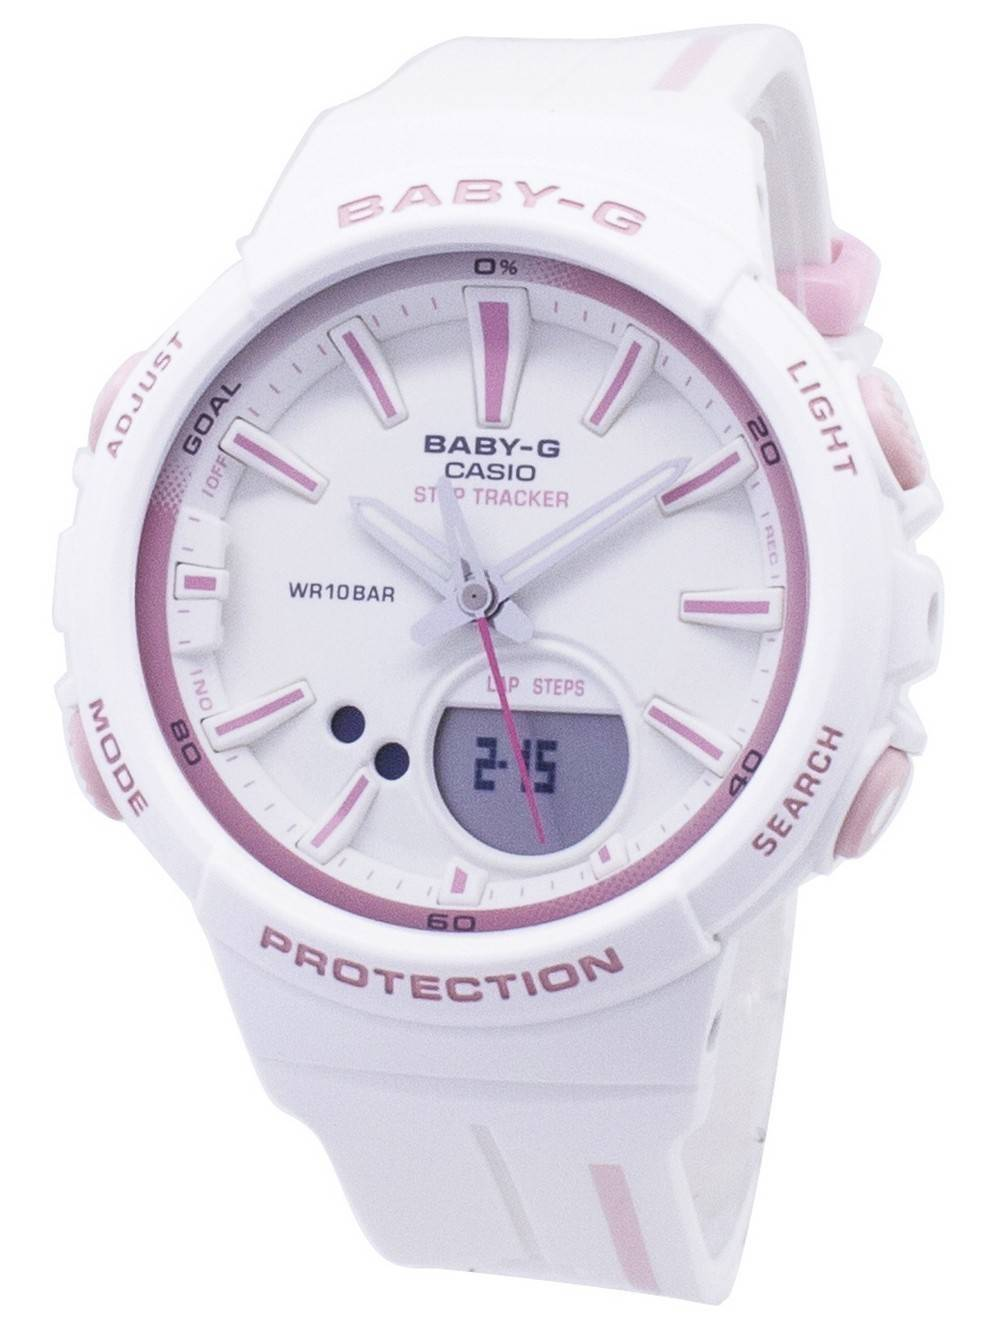 9cd6be0d3bc Casio Baby-G BGS-100RT-7A BGS100RT-7A Step Tracker Analog Digital Women s  Watch